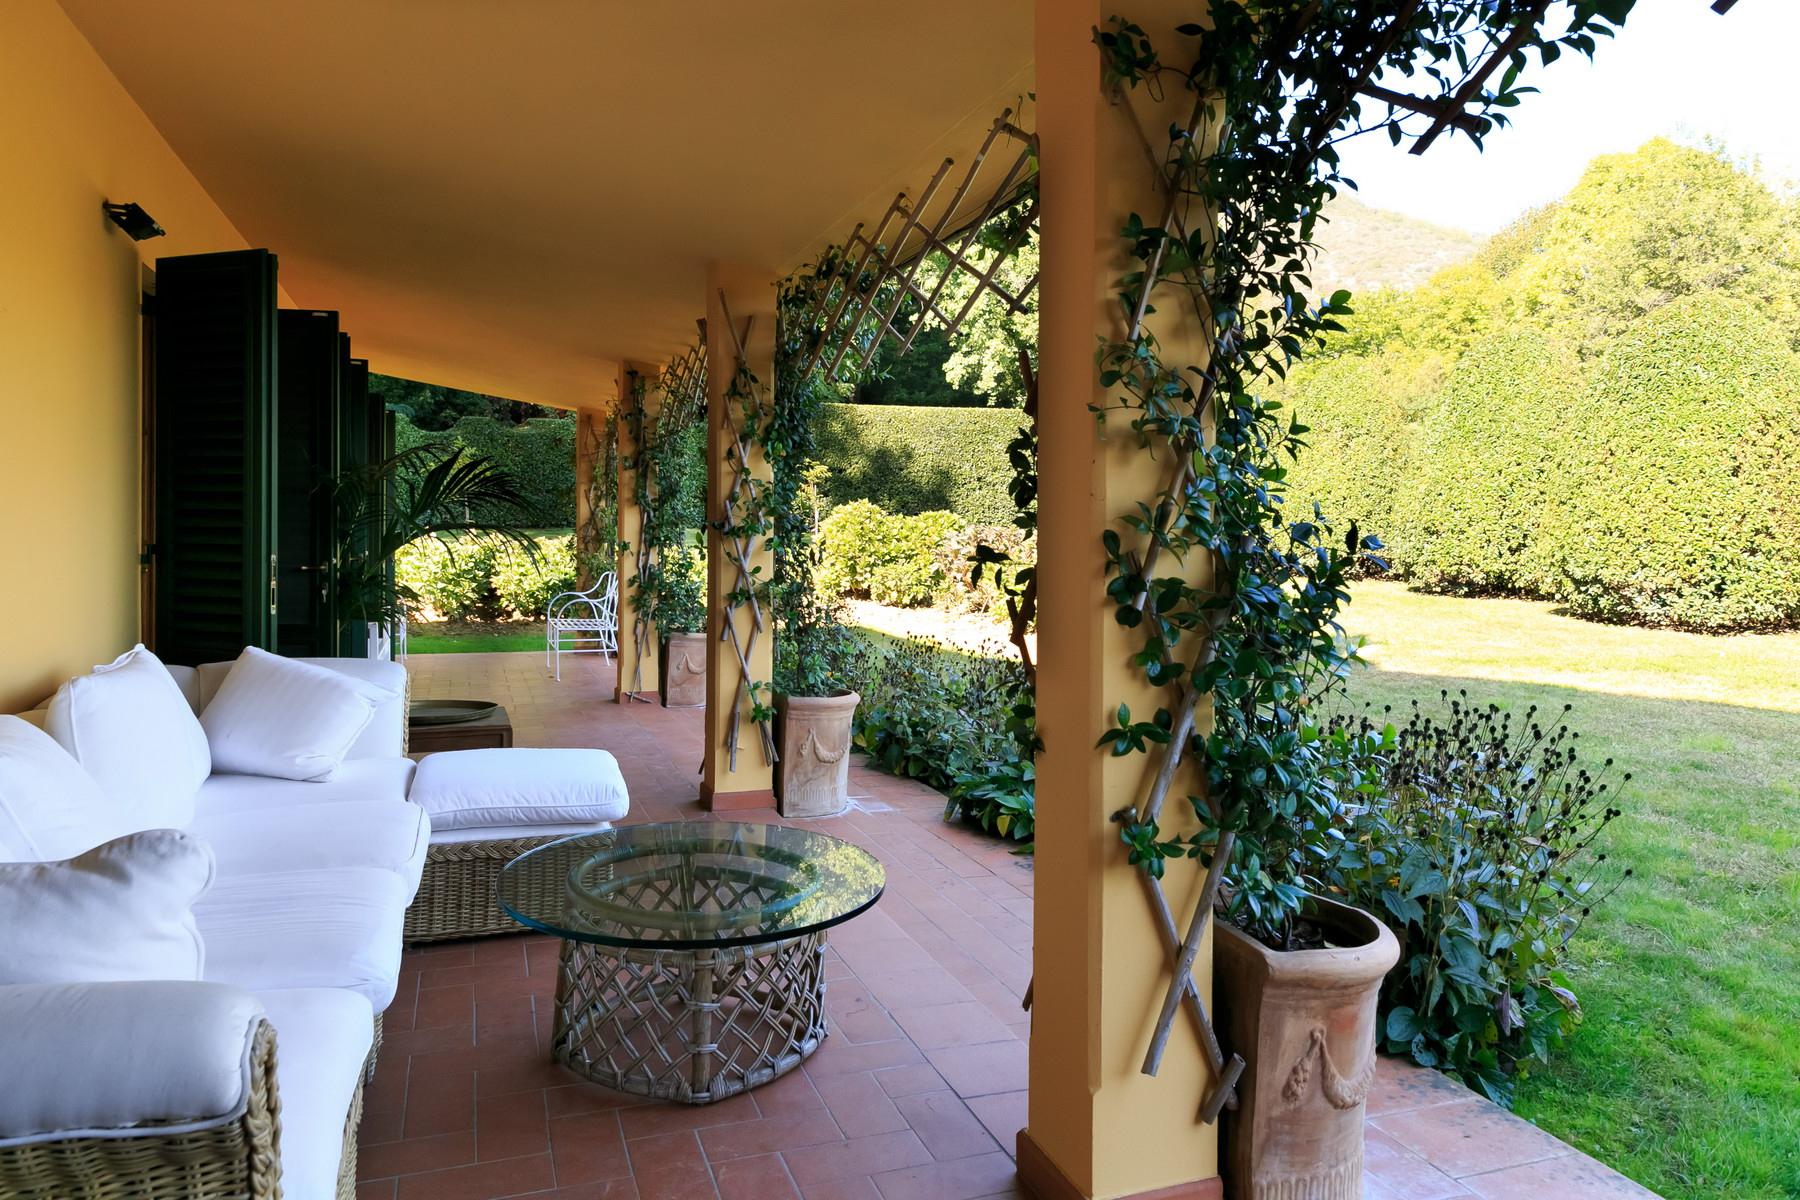 Villa in Vendita a Lucca: 5 locali, 900 mq - Foto 5